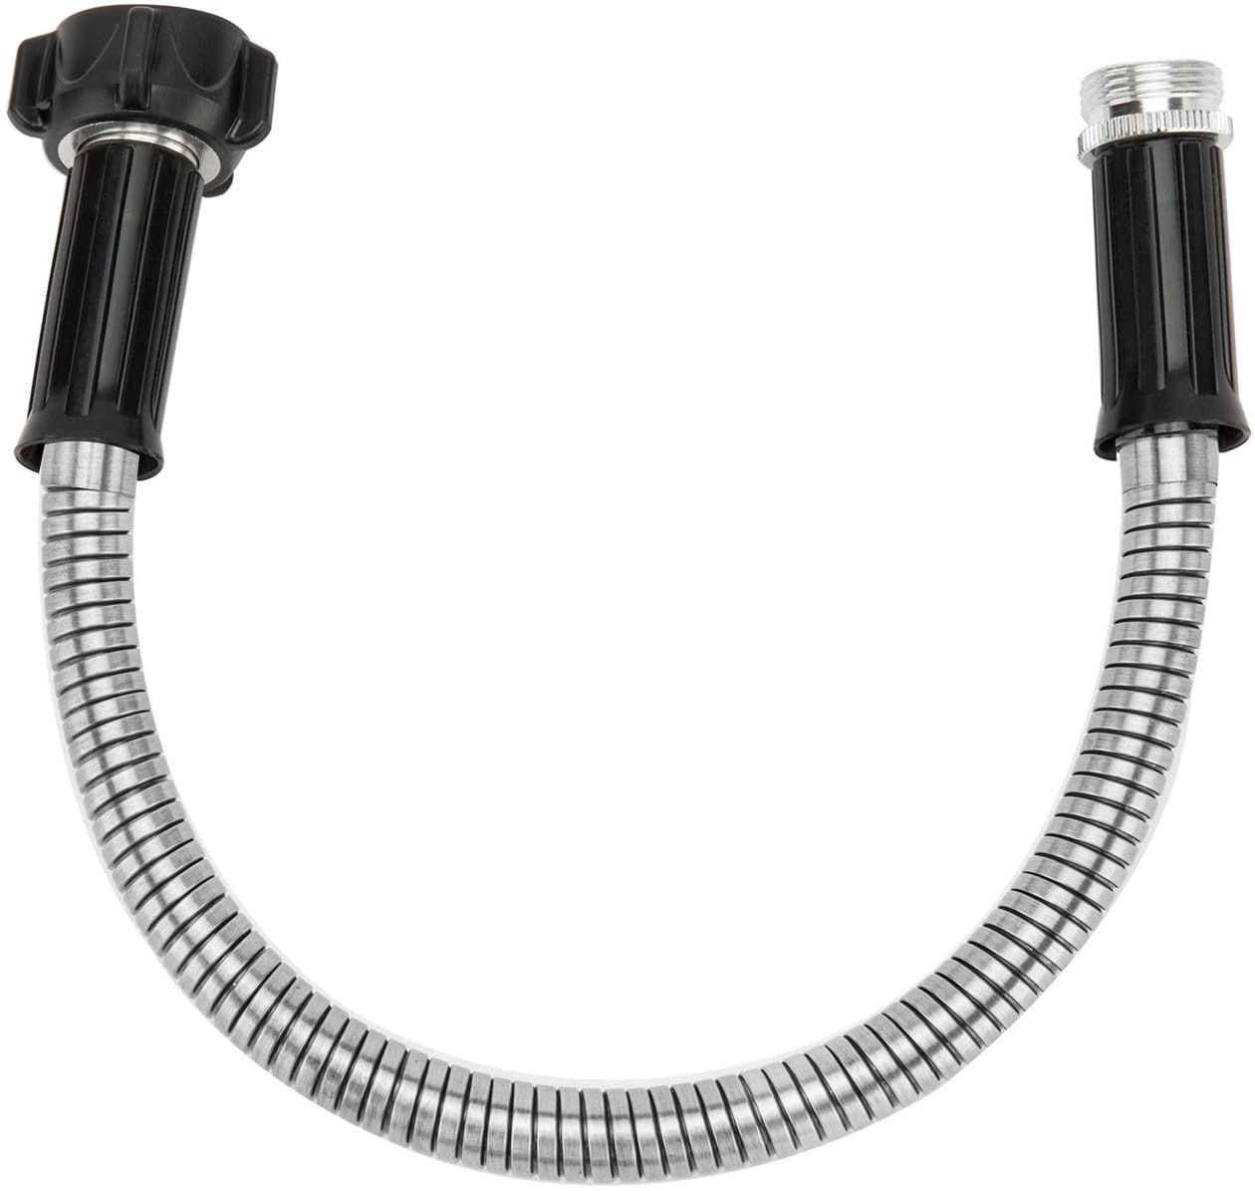 Yanwoo 304 Stainless Steel 1 Feet Short Garden Hose, Flexible Bathroom Hose, Portable Outdoor Hose